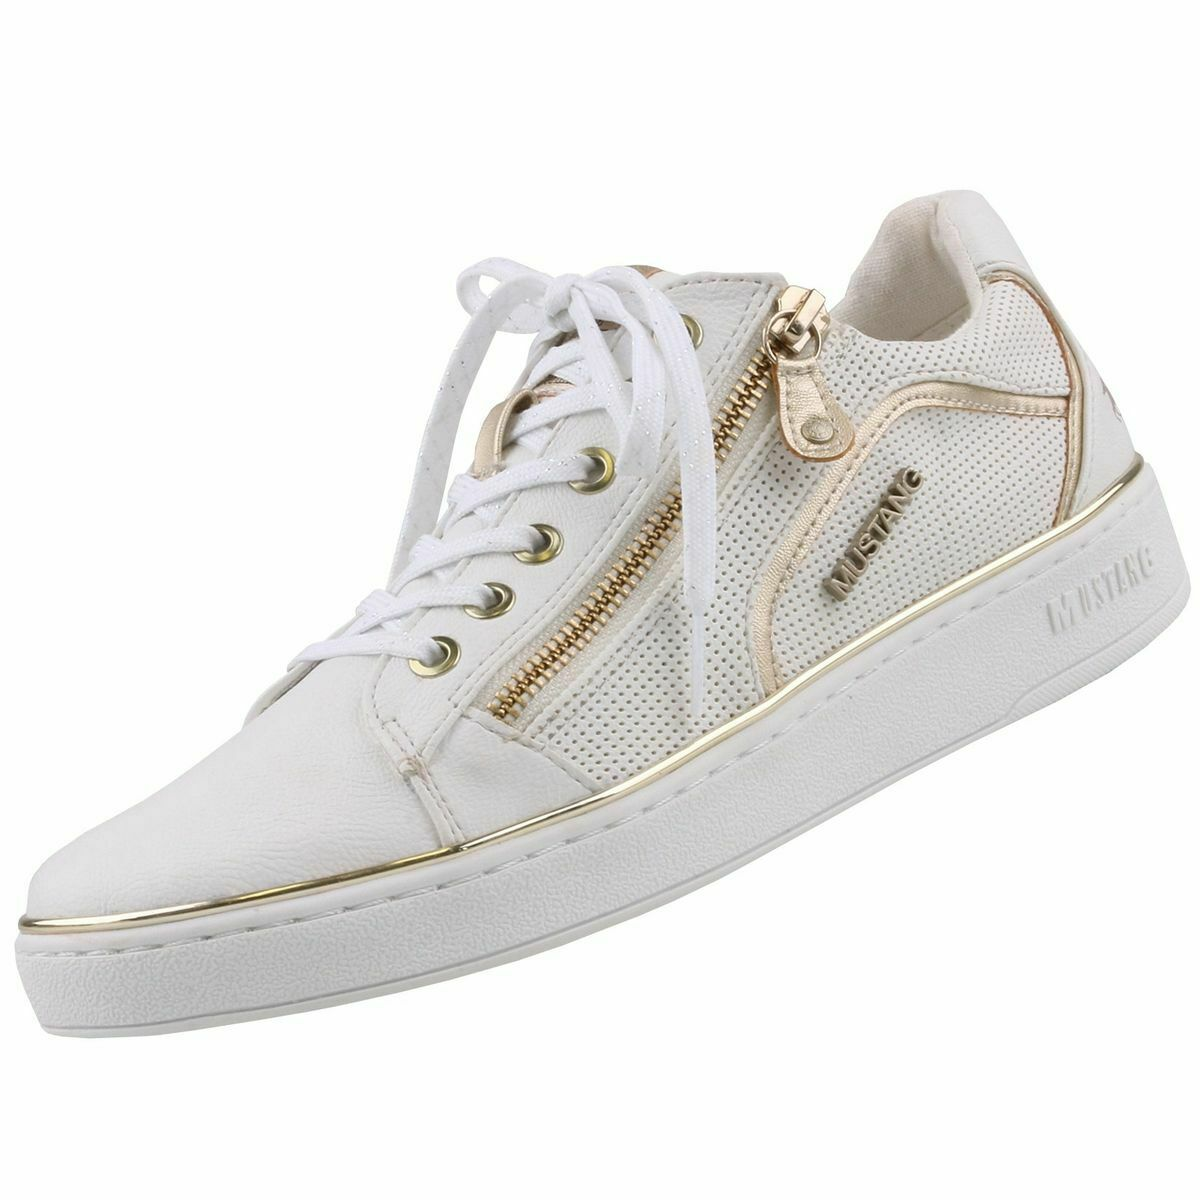 Neuf MUSTANG Chaussures Femmes Chaussures baskets Chaussure Lacée chaussures basses chaussures de loisirs